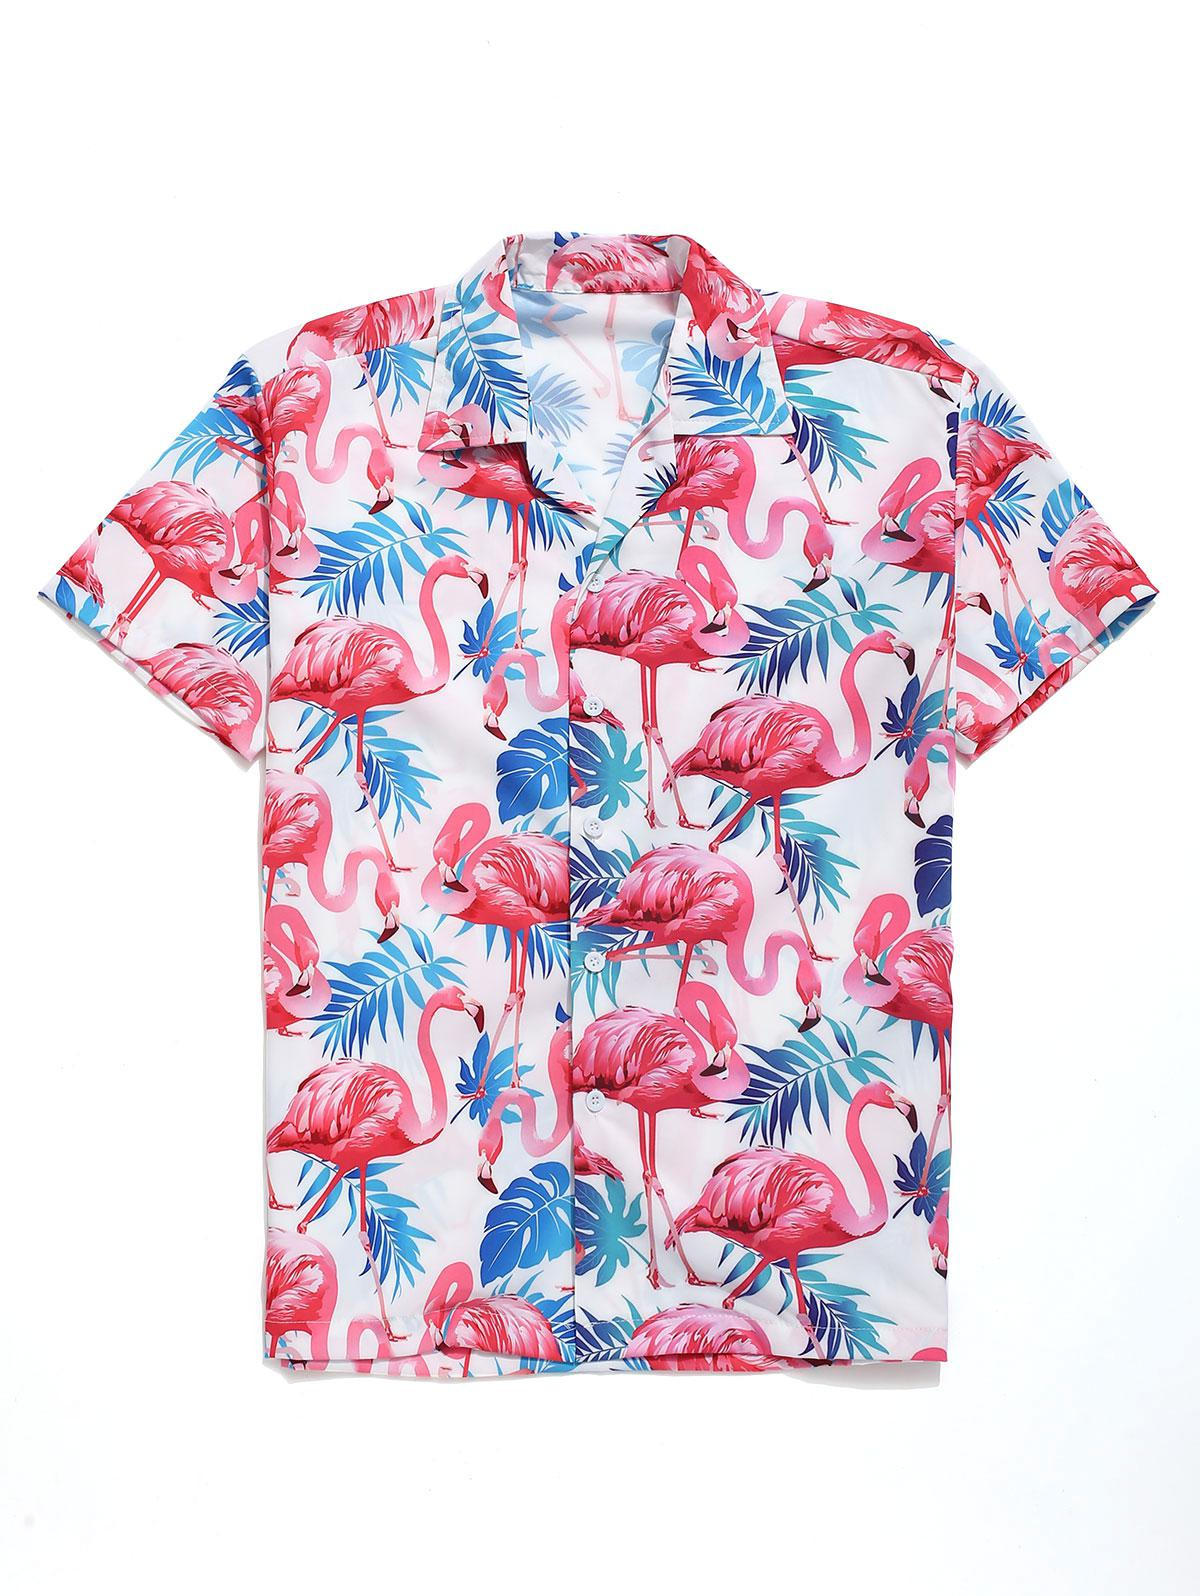 Tropical Leaves Flamingo Print Beach Shirt фото